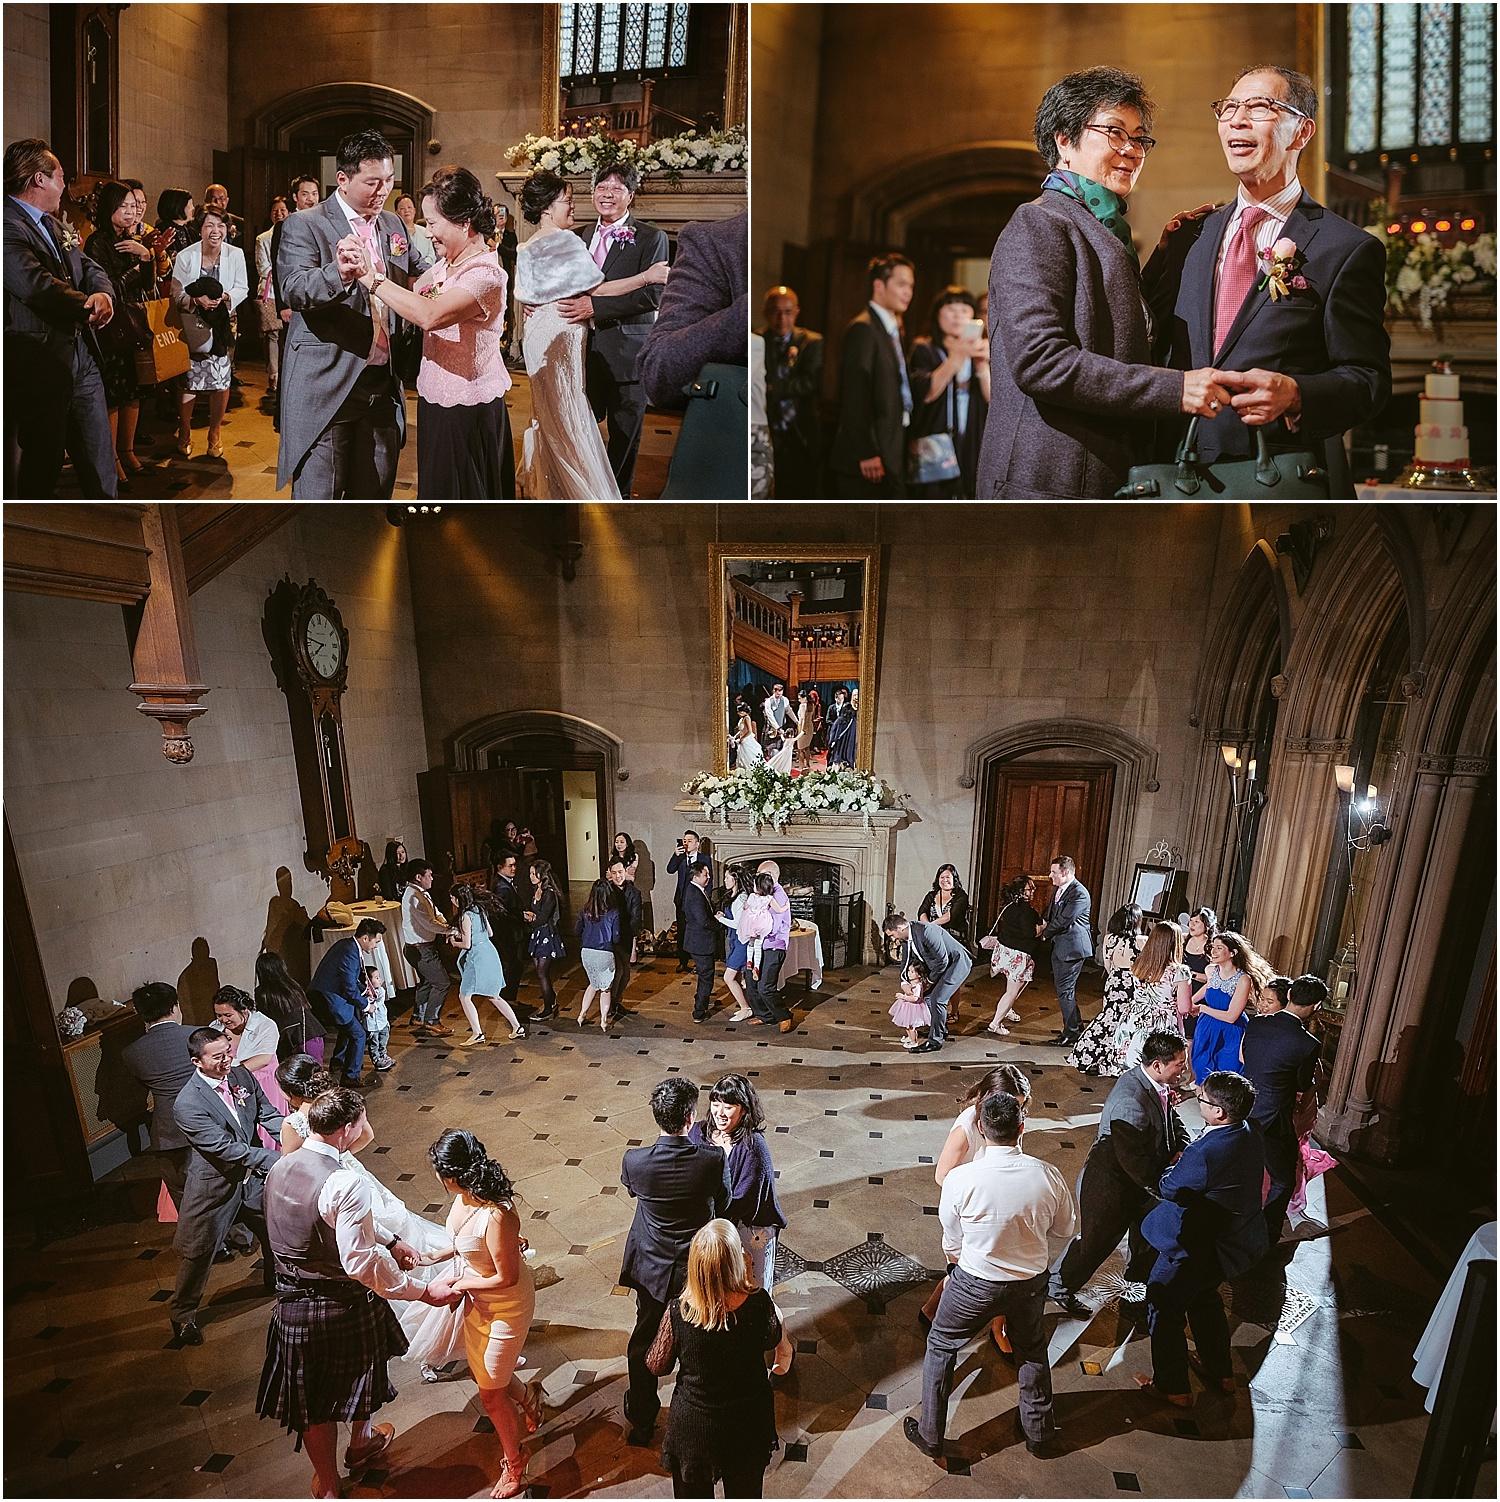 Matfen Hall wedding photography photography by www.2tonephotography.co.uk 079.jpg